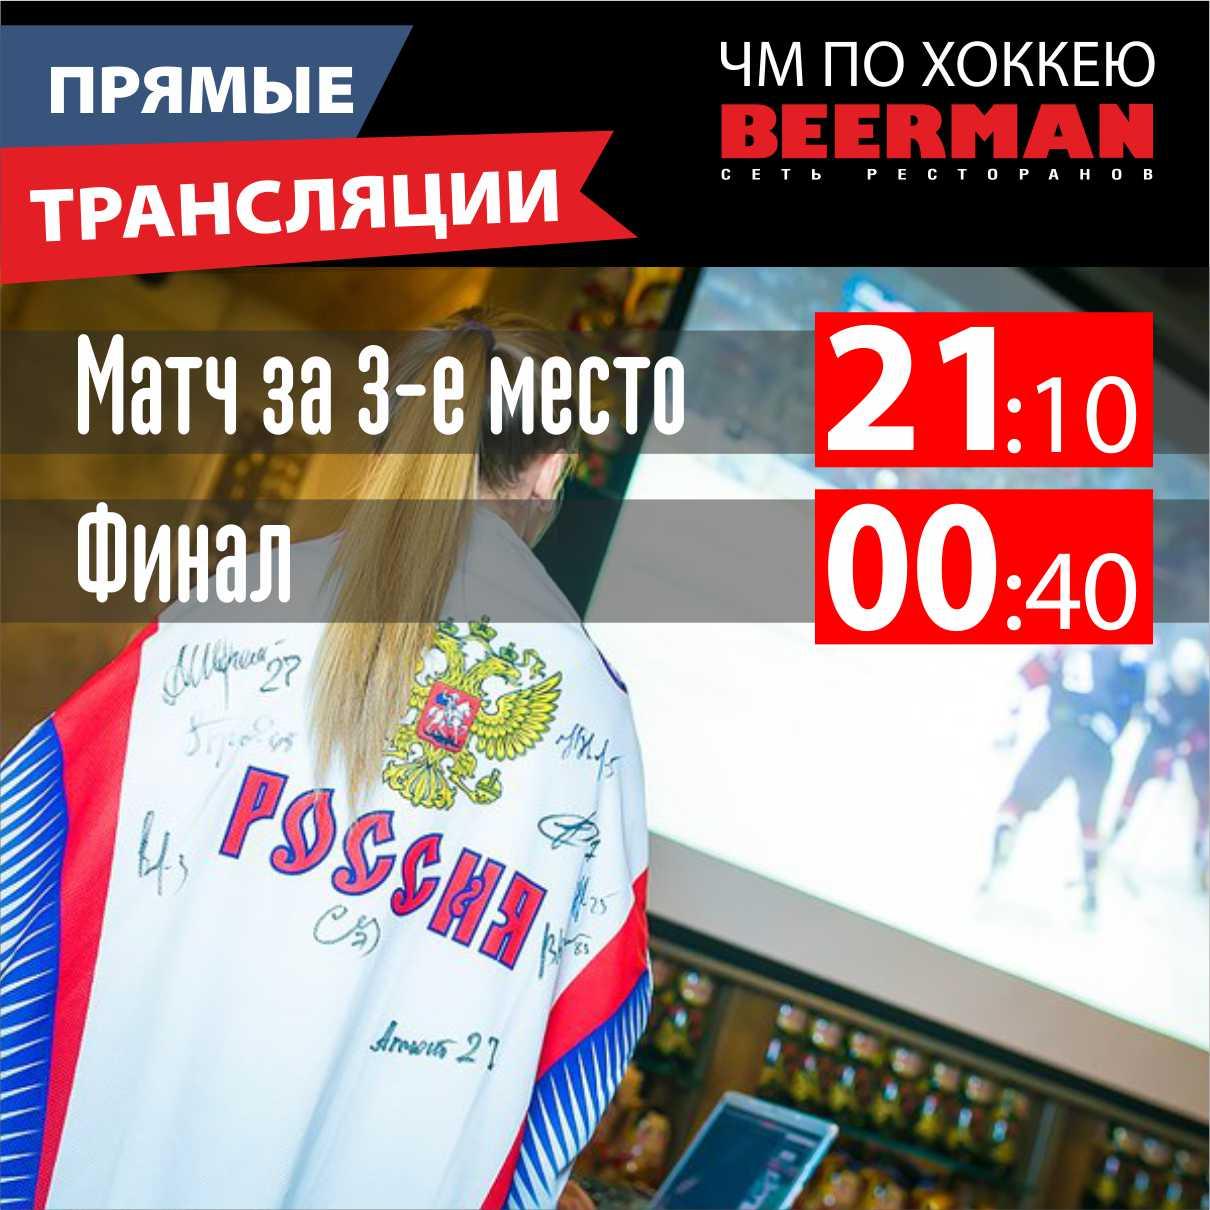 ЧМ ХОККЕЙ_9